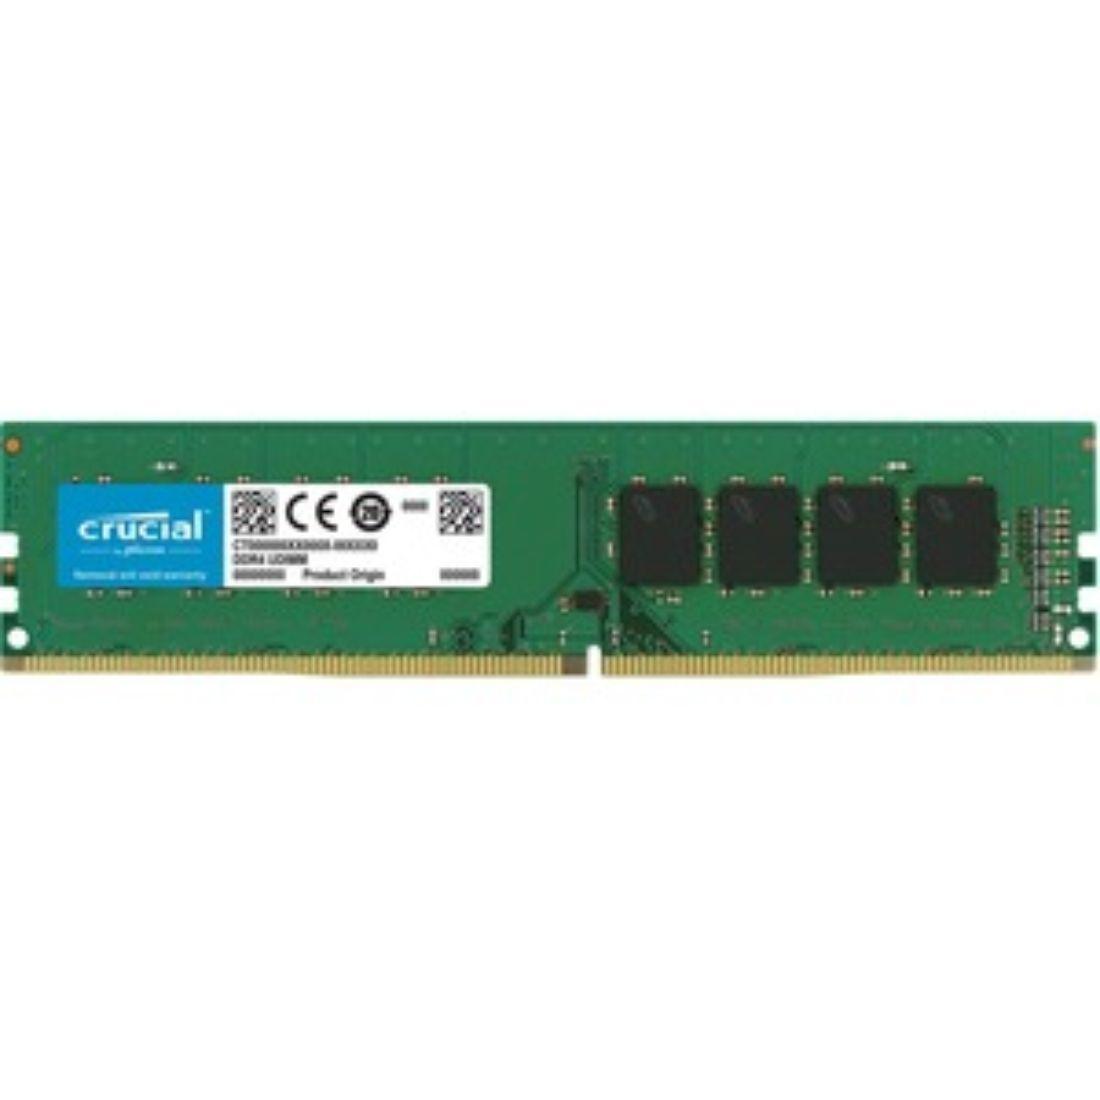 Crucial 8GB DDR4 2666MHz 288-Pin DIMM Memory Module CT8G4DFS